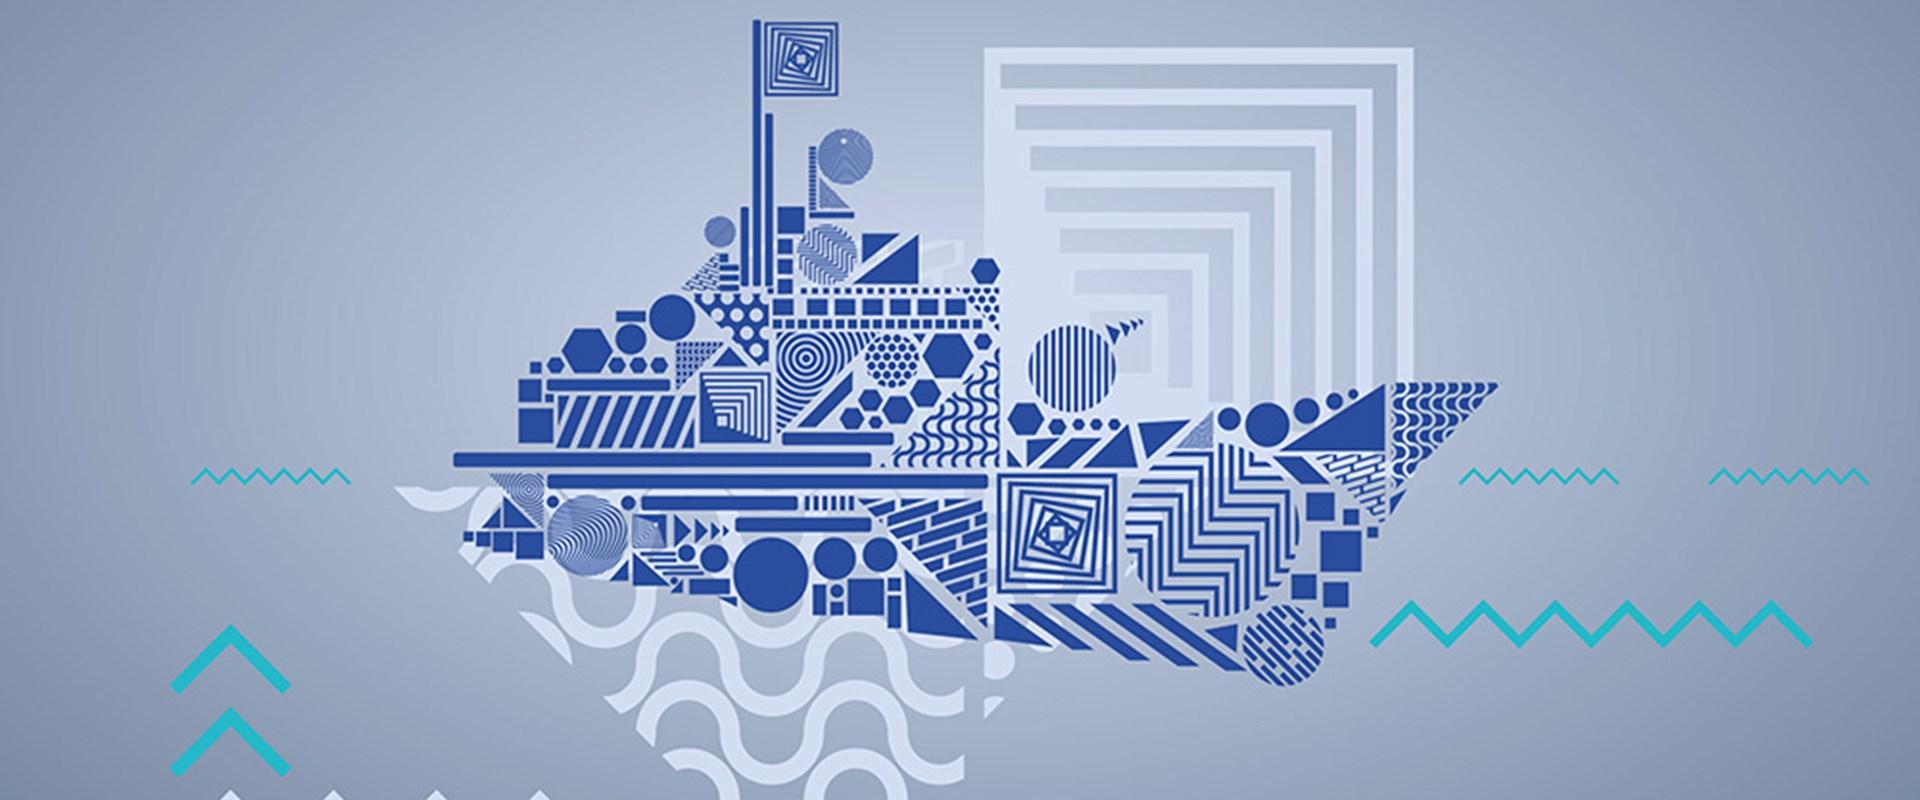 Warship - banner